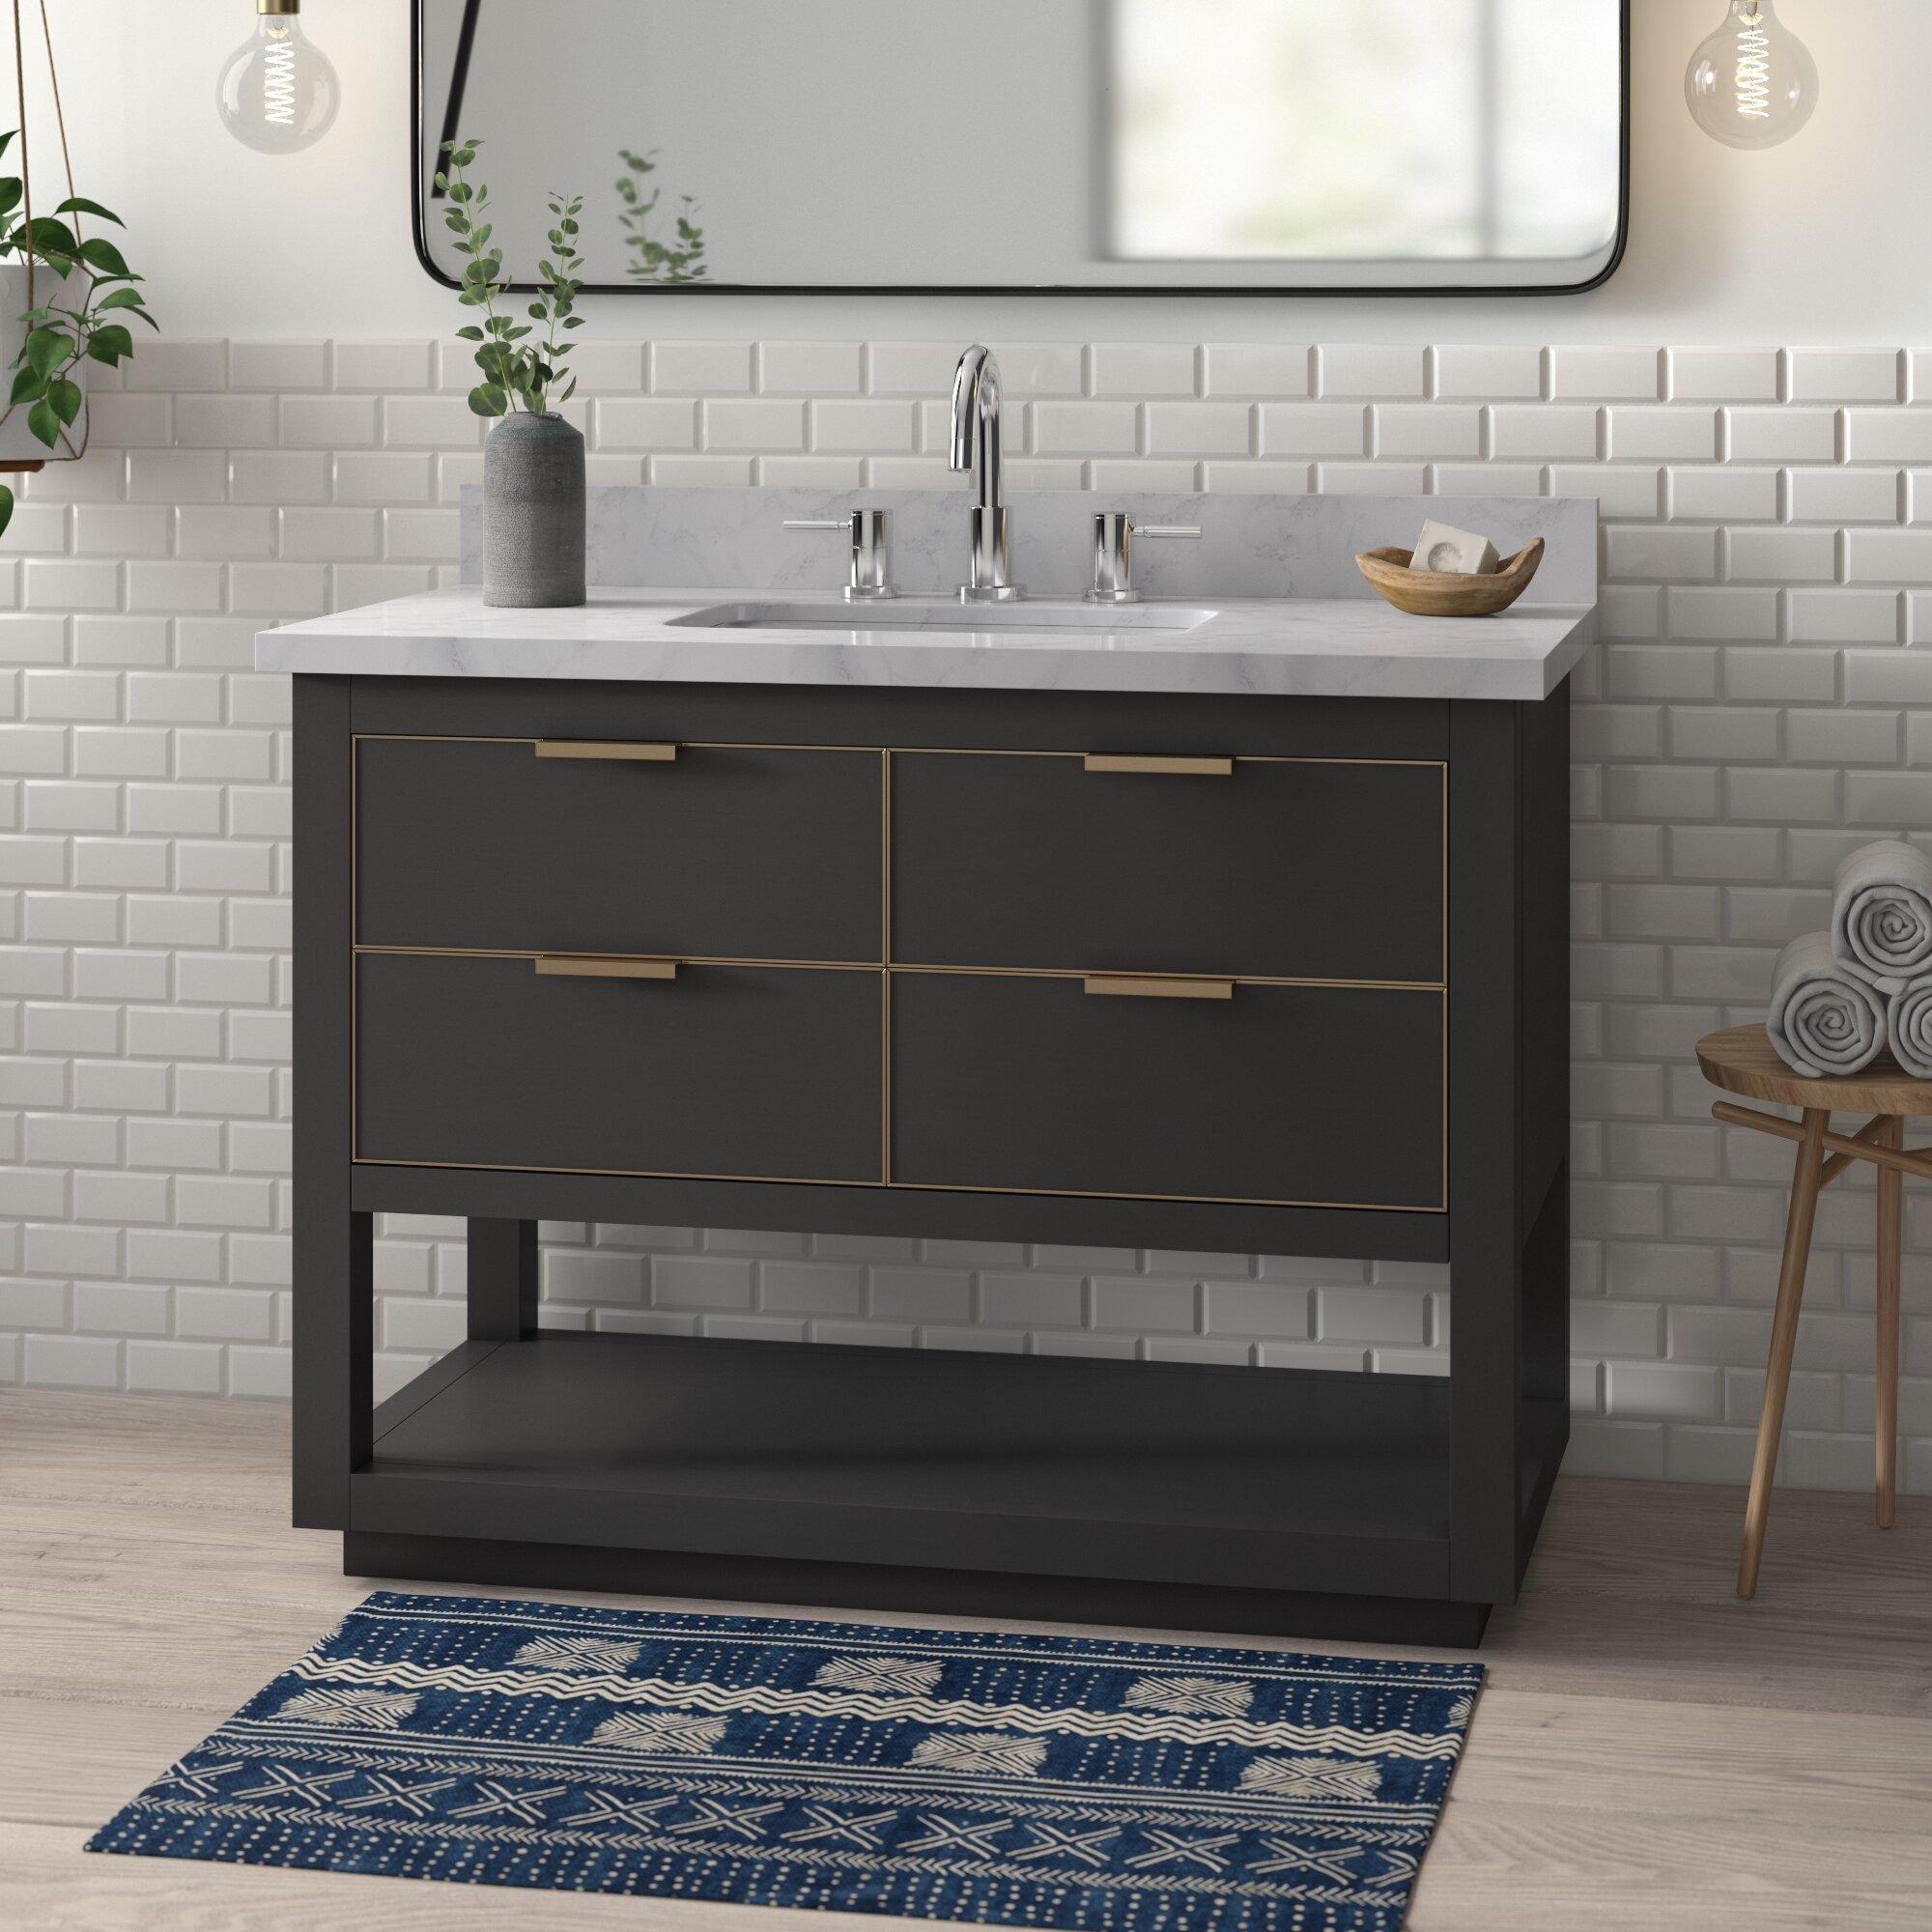 Hot Sale New European Style Bathroom Vanity Cabinet Buy Bathroom Vanity Cabinet Vanity Bathroom Cabinet European Vanity Product On Alibaba Com